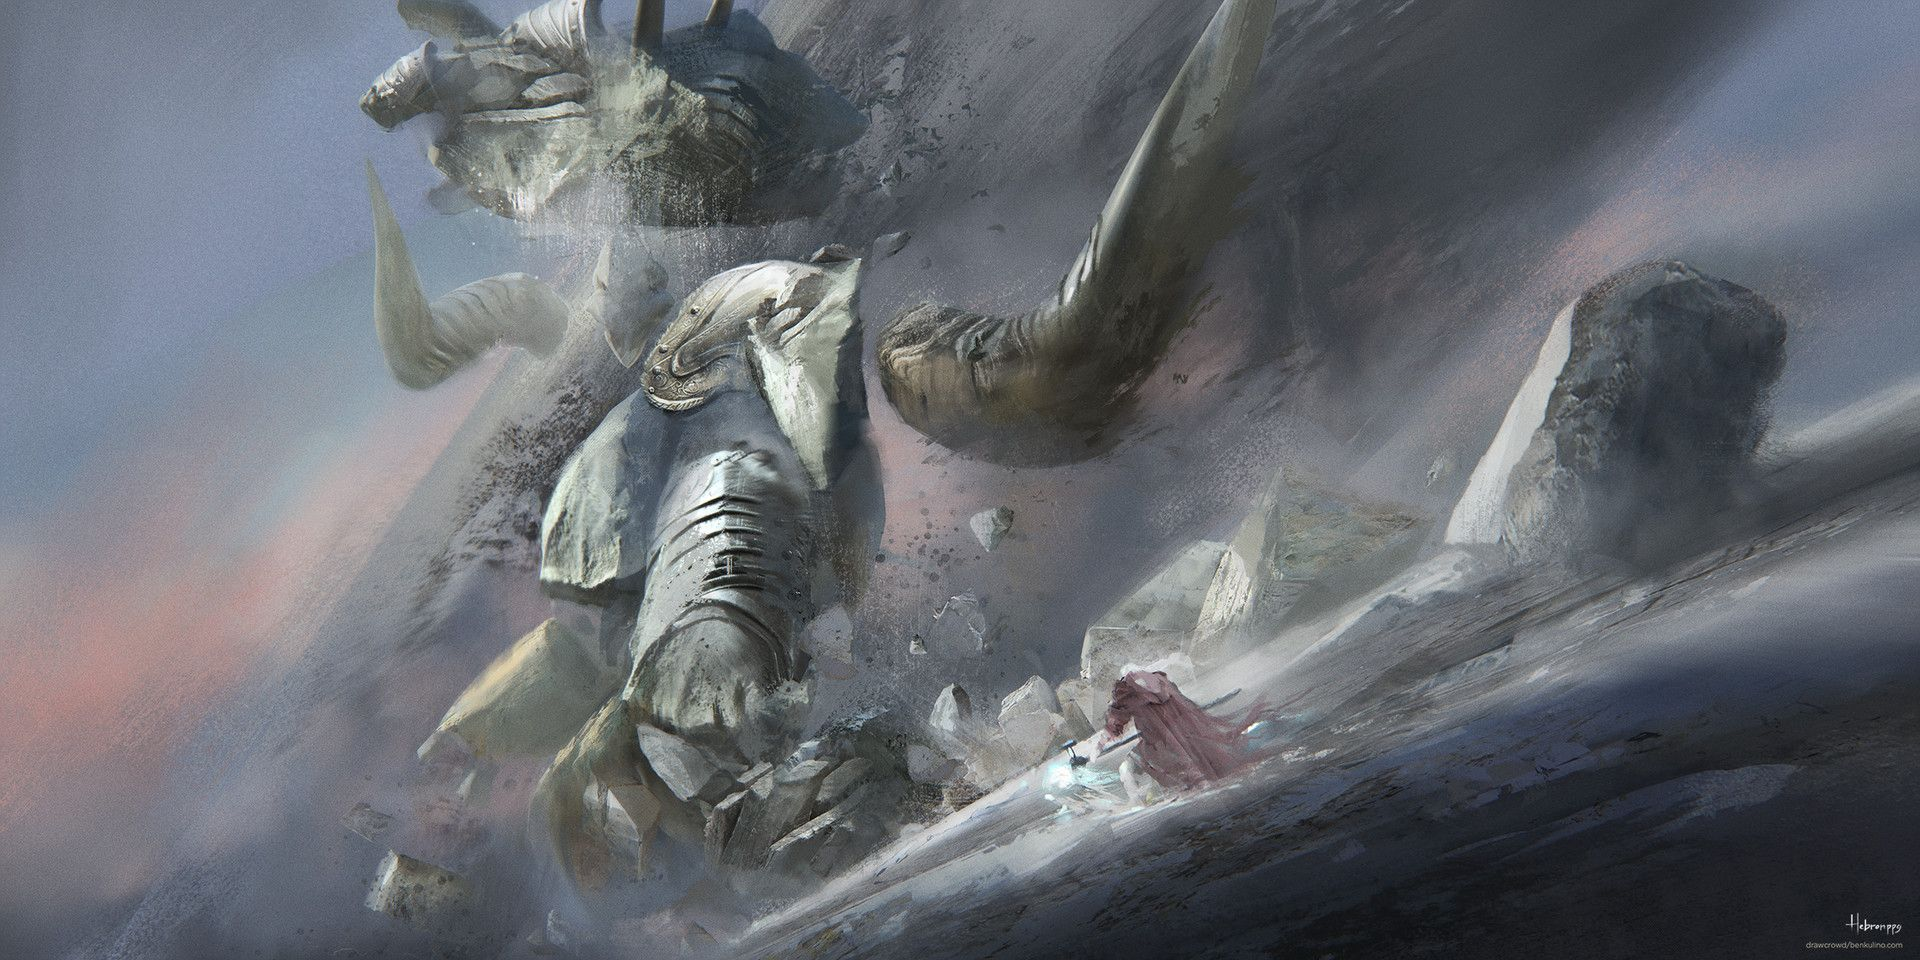 ArtStation - The Last Weapon (Goliath), Hebron PPG